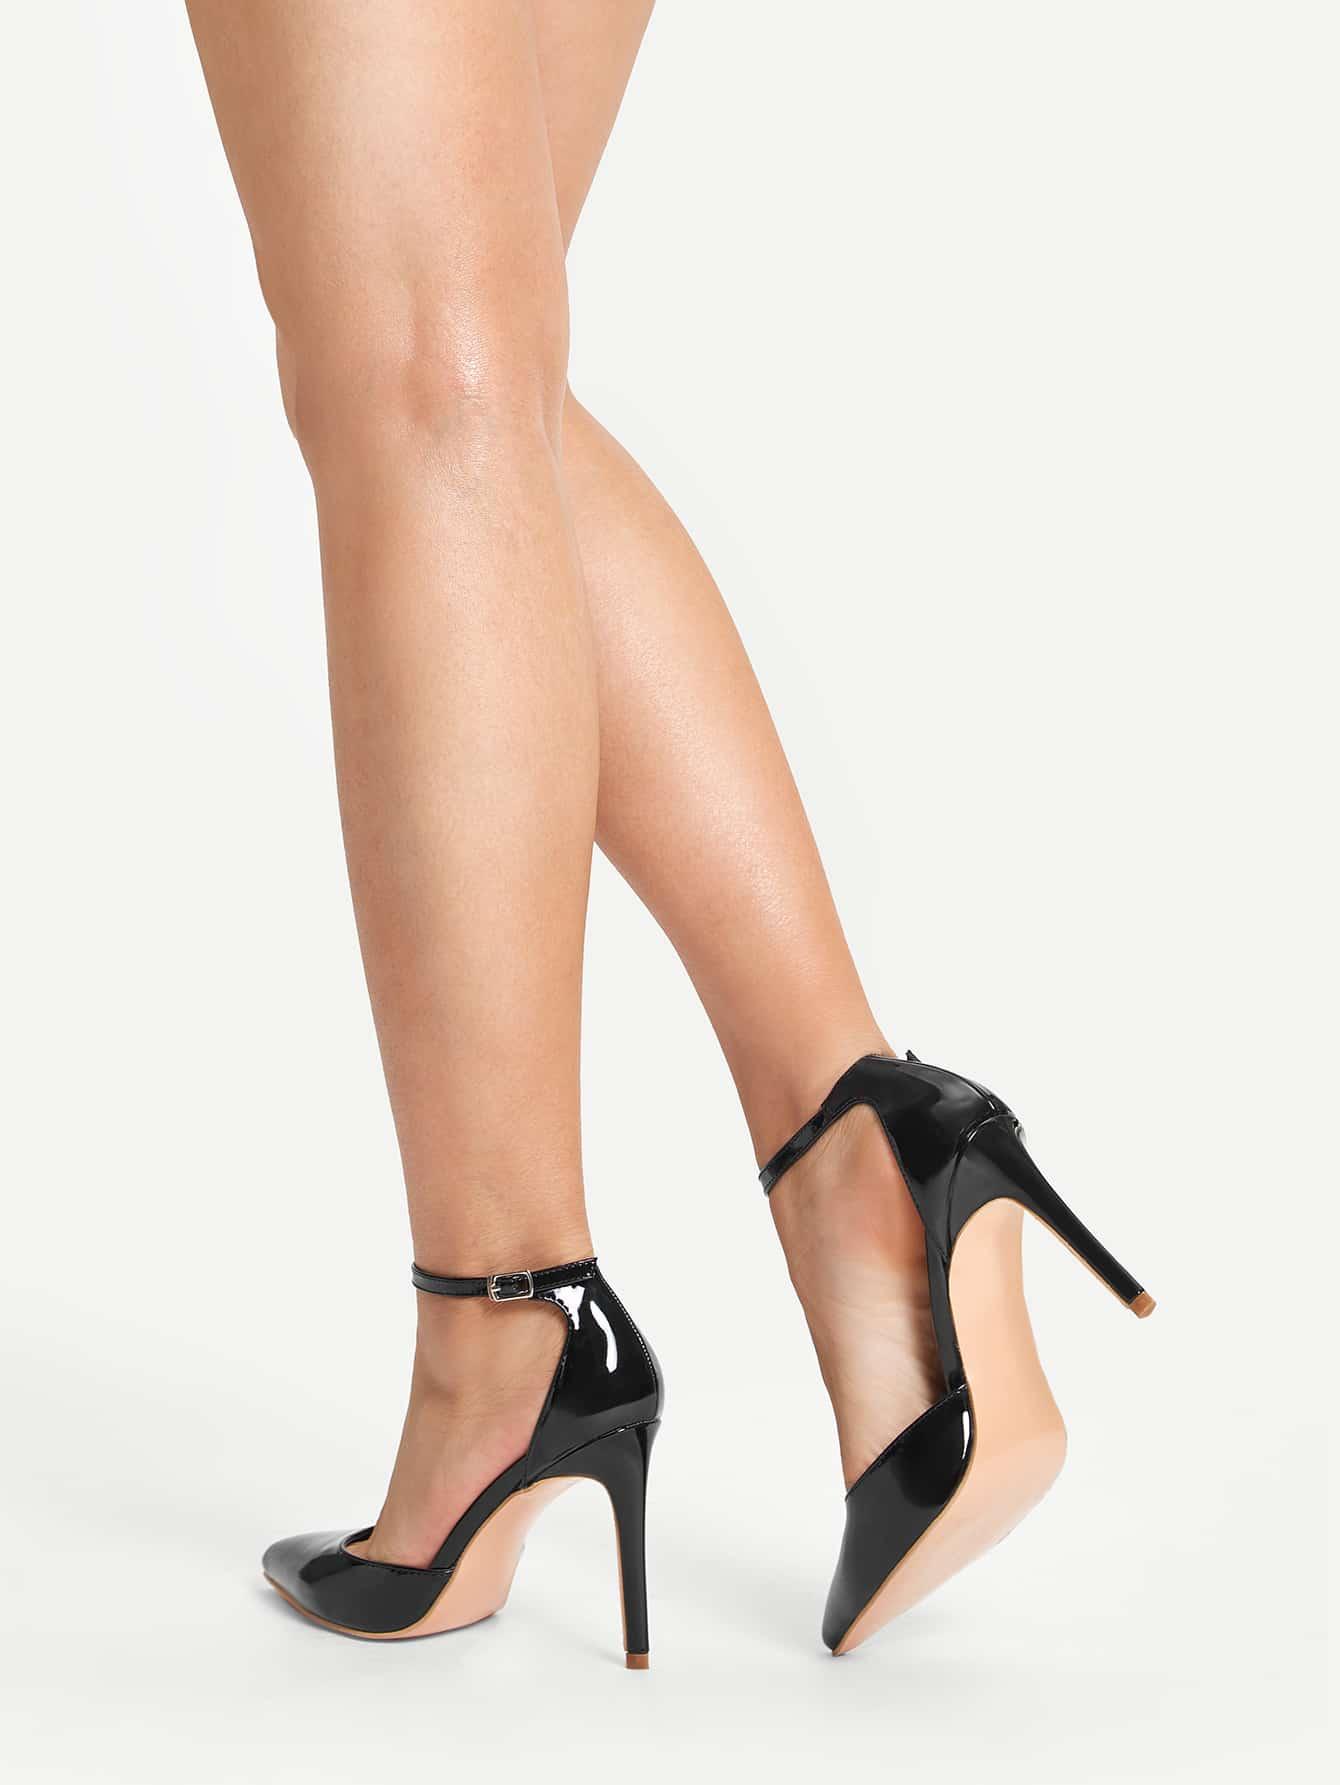 Cheap Black Pump Heel, find Black Pump Heel deals on line